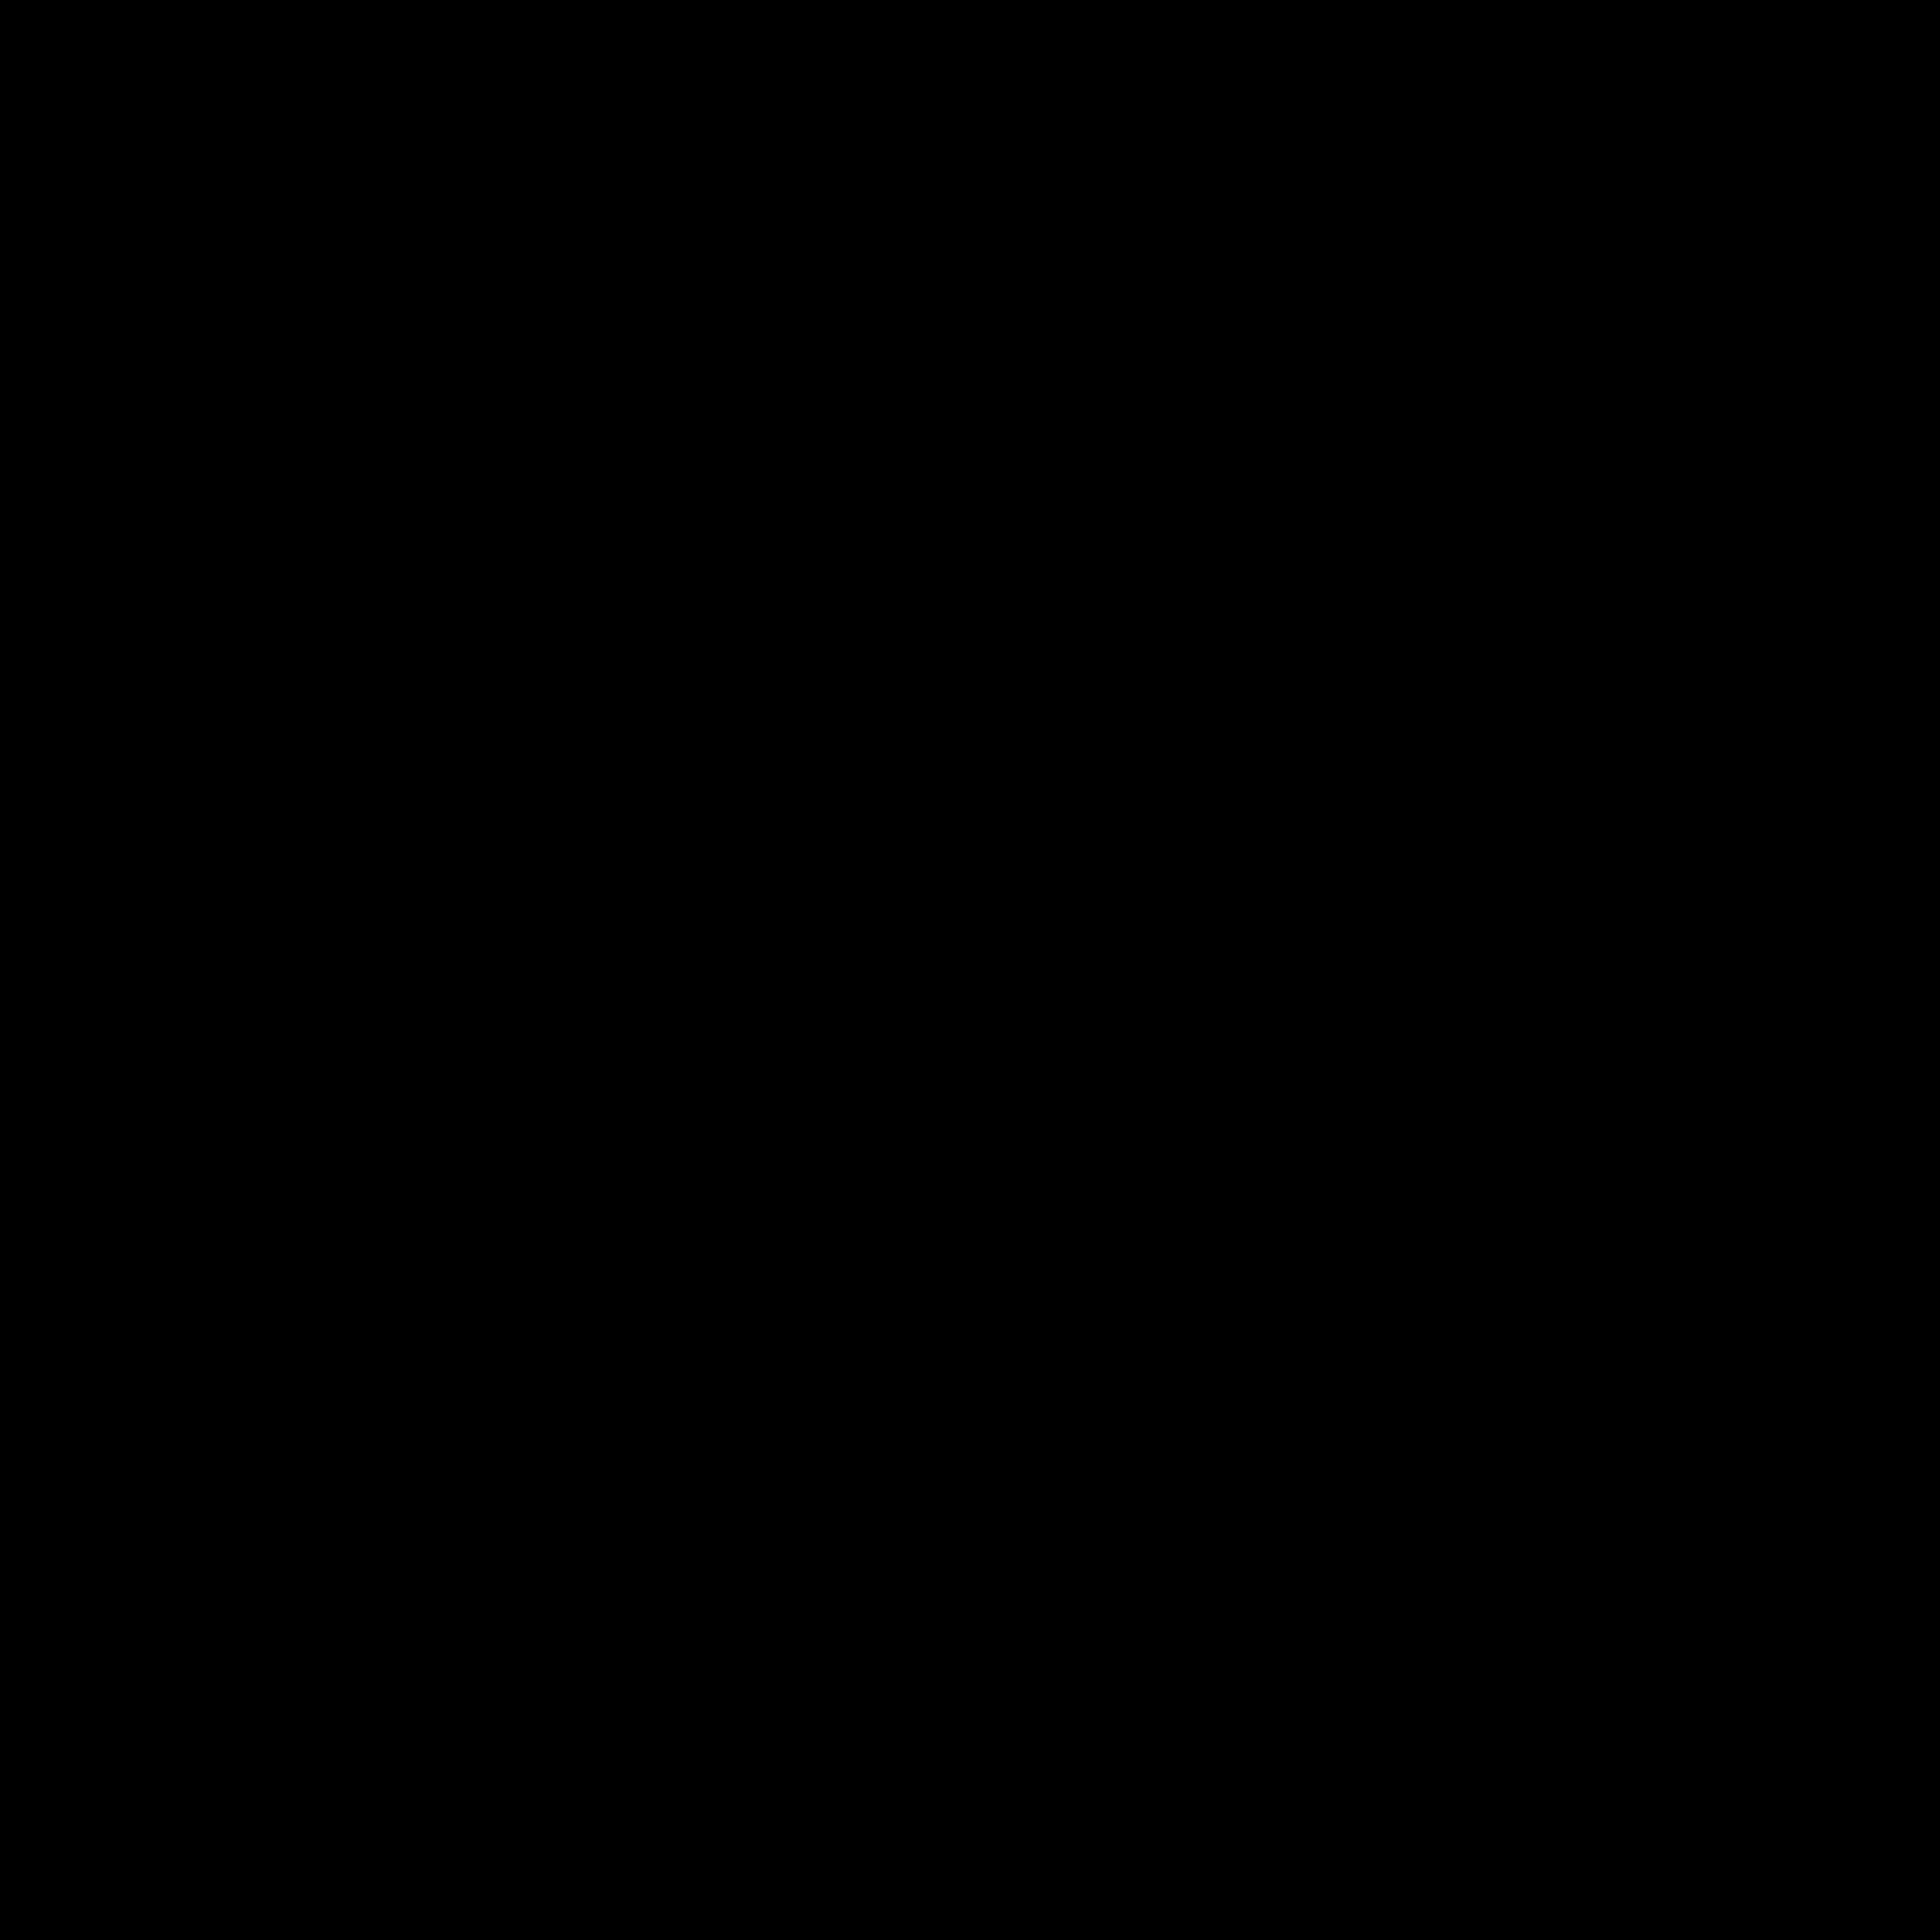 jenna-lynn-photography-boudoir-logo-black